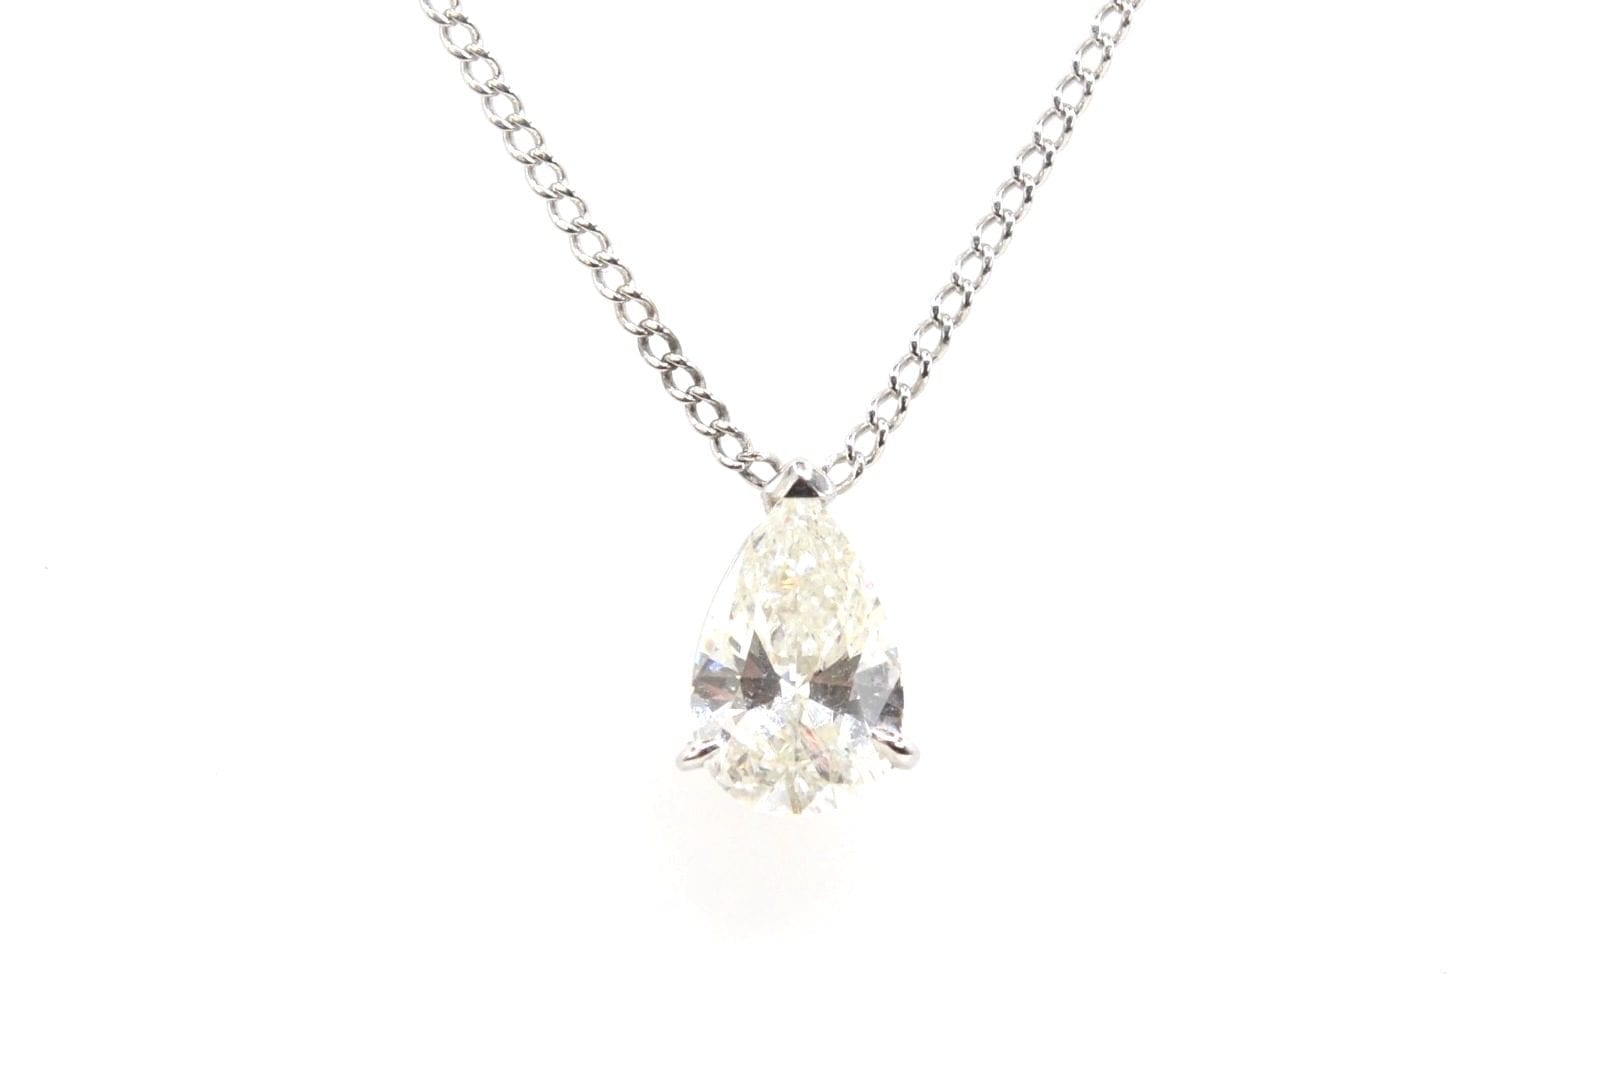 pendentif diamant poire en or blanc 18k